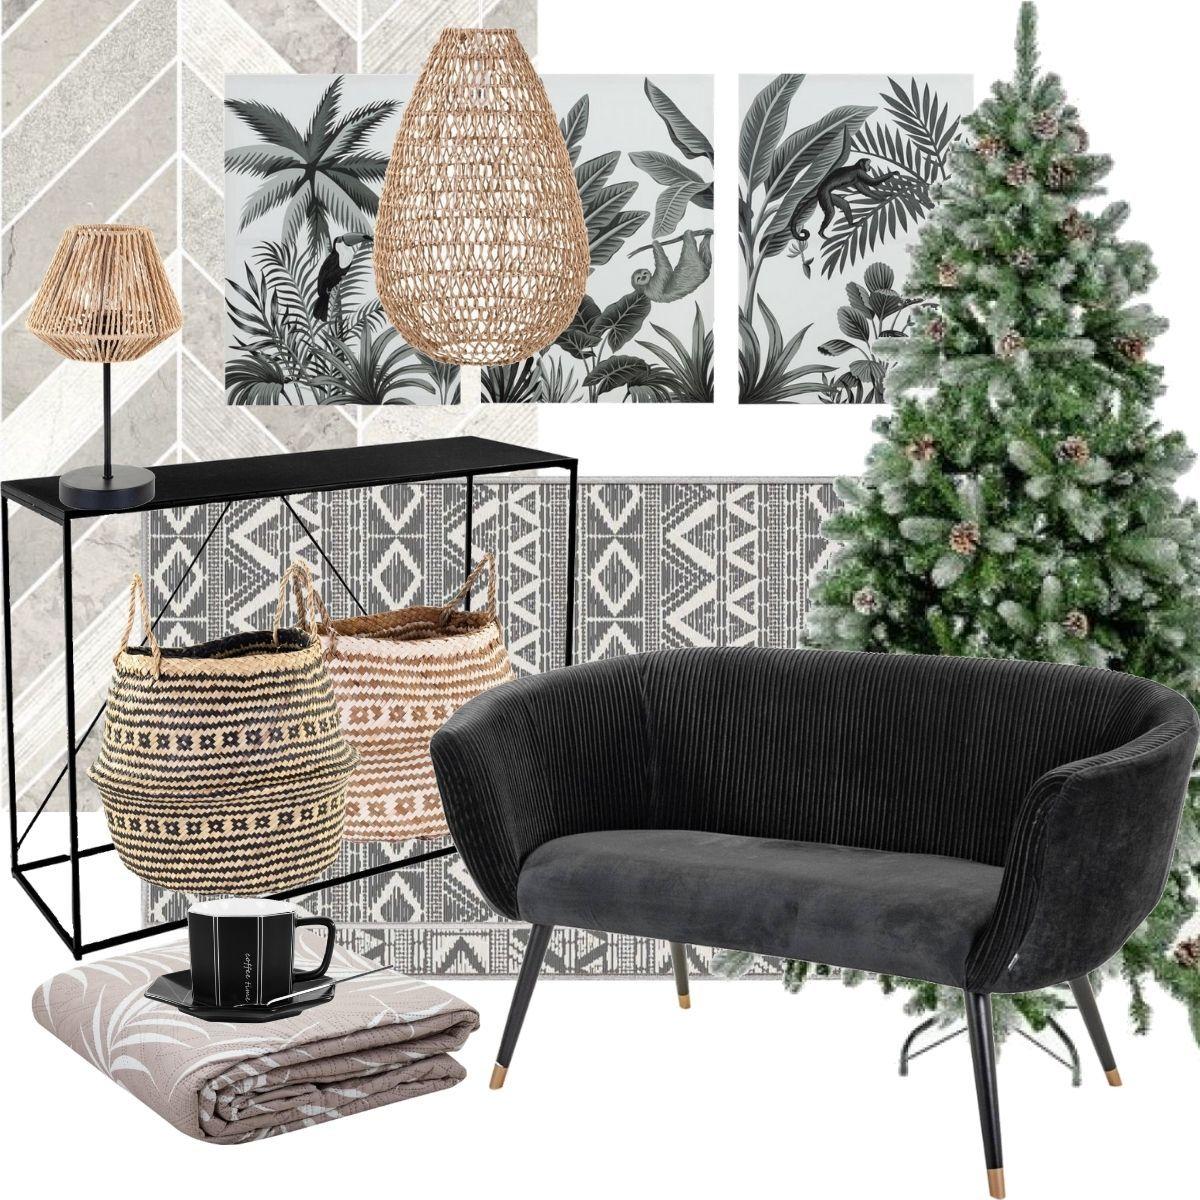 organikus karácsonyi dekor